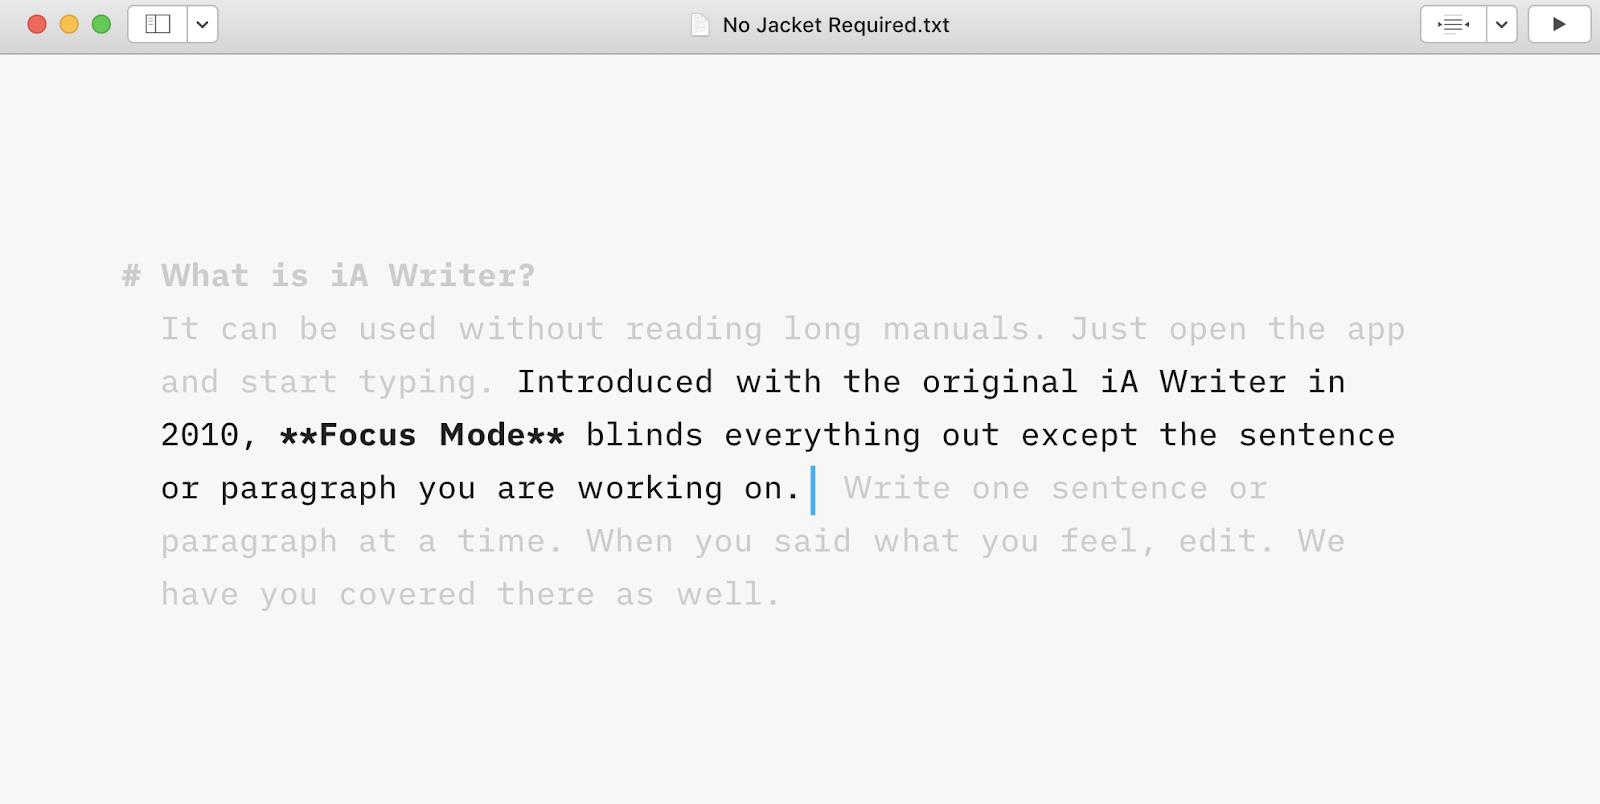 Screenshot of iA writer app interface